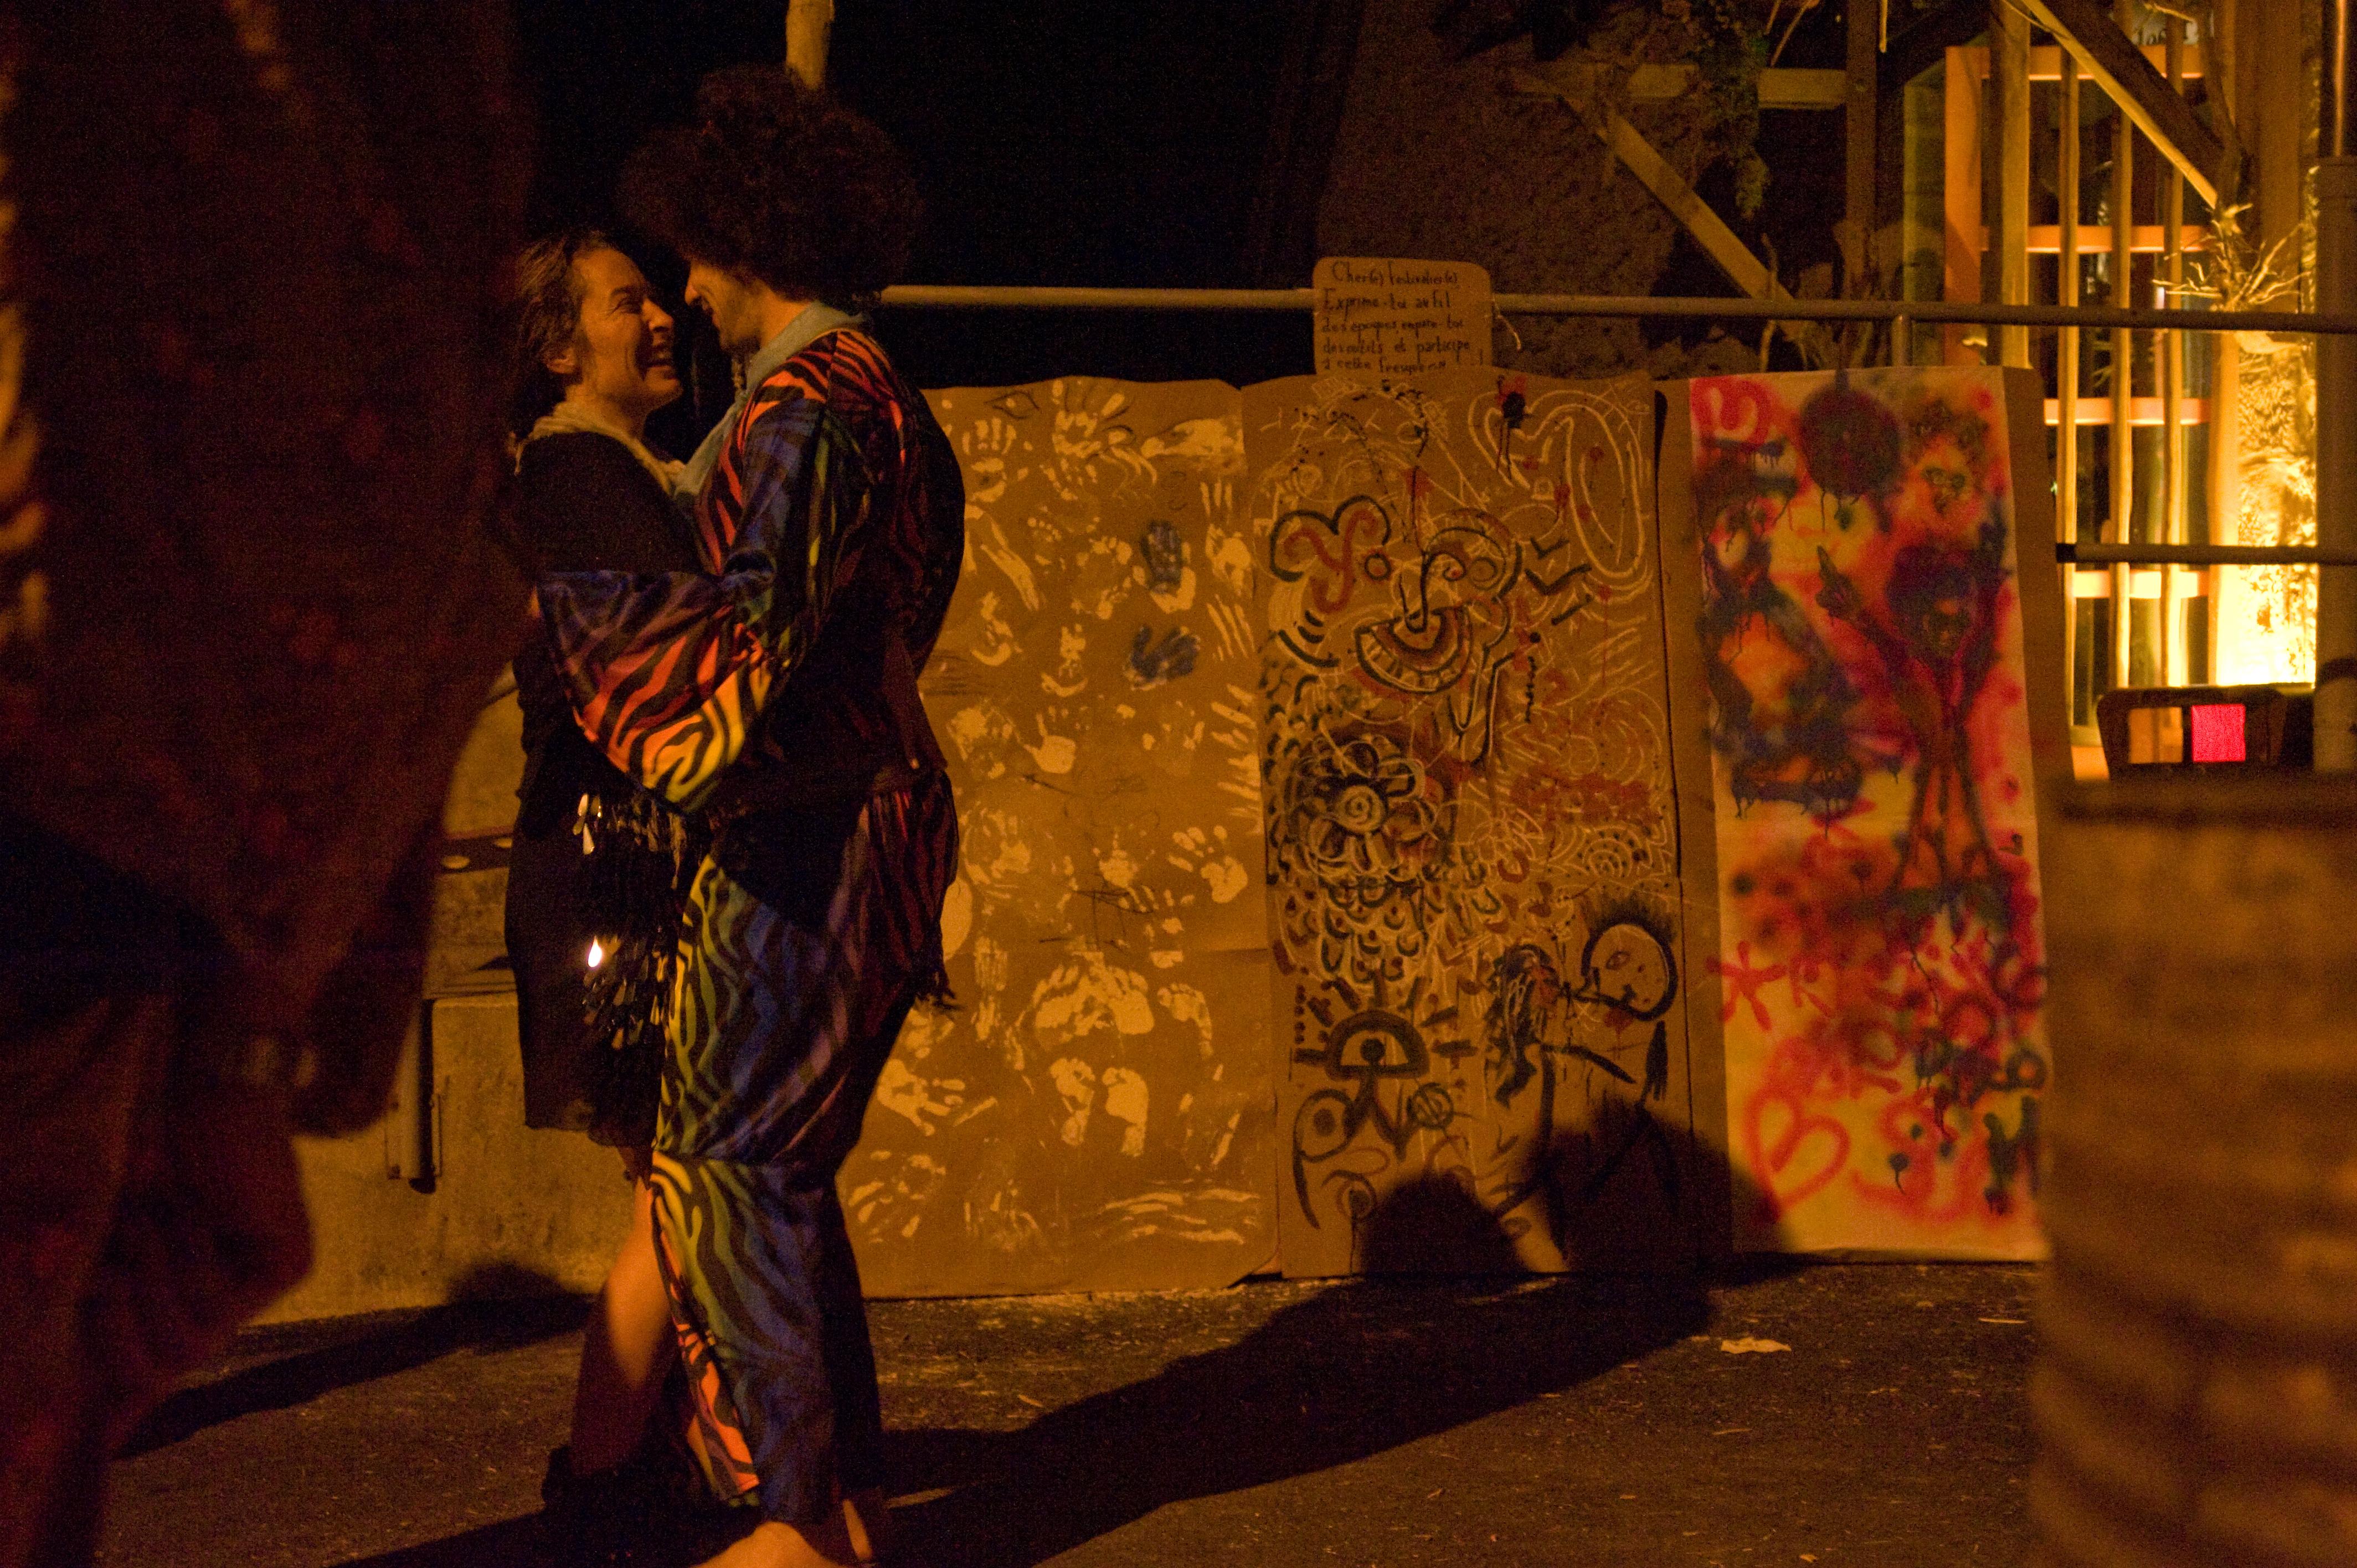 Nuit du Folk Dioise 2017 - ╕Sophie Dartigeas - 159